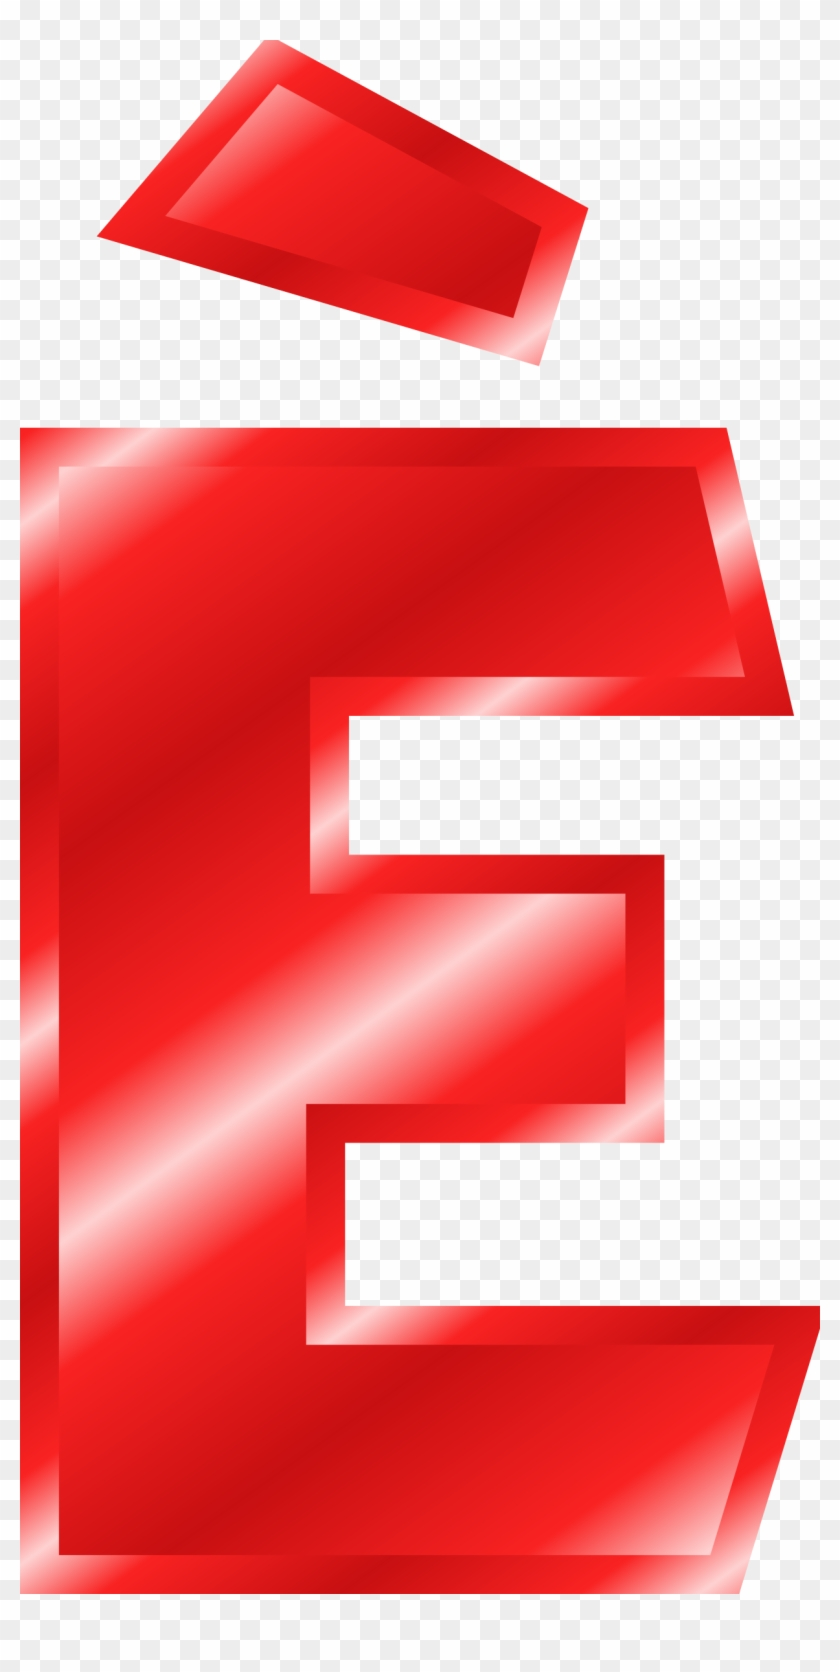 E clipart design alphabet. This free icons png